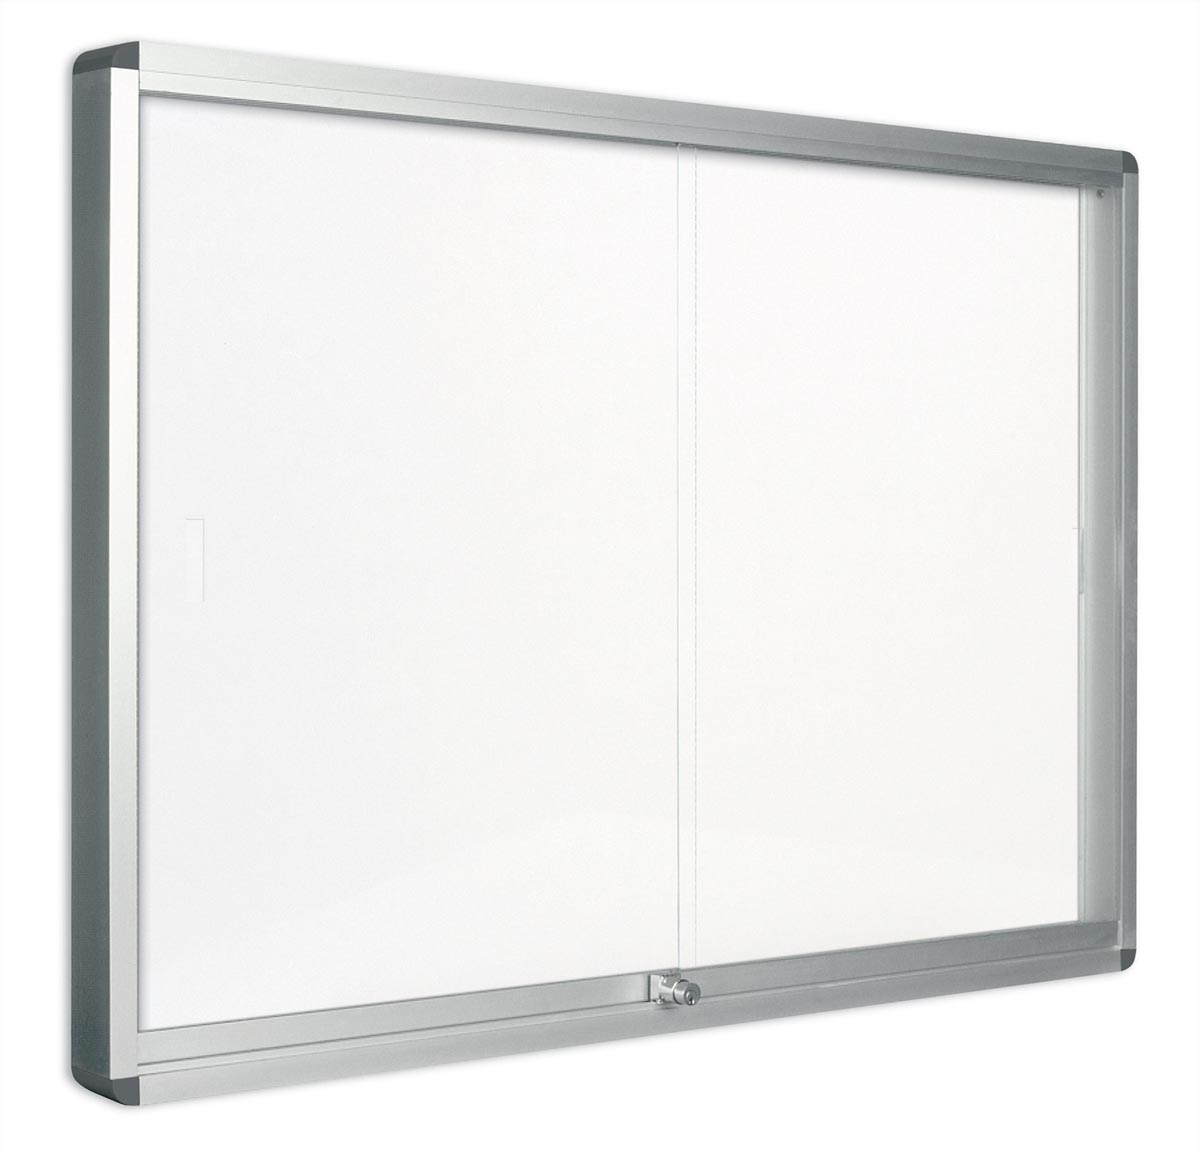 Pergamy glazen vitrine met schuifdeur en magnetische achtergrond ft 12 x A4